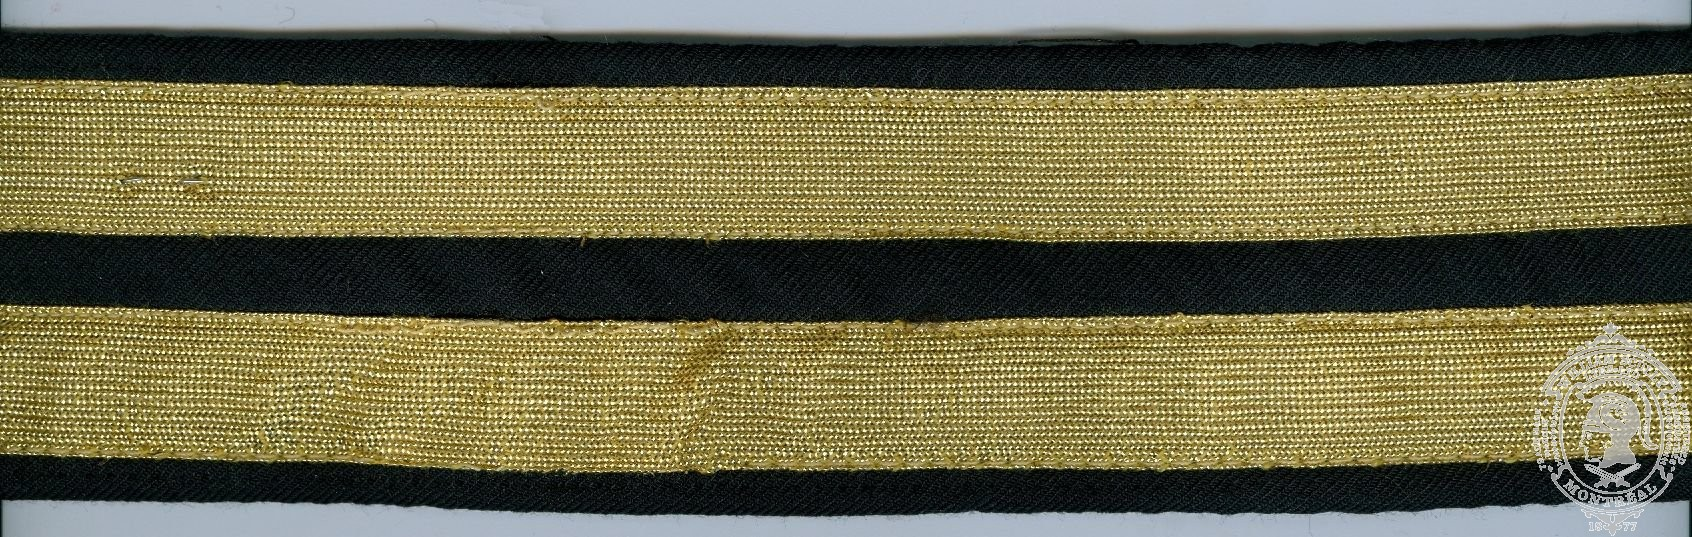 "2-1/4"" Ceremonial Belt, Fabric, 2 Rows 3/4"" Metallic Braid"